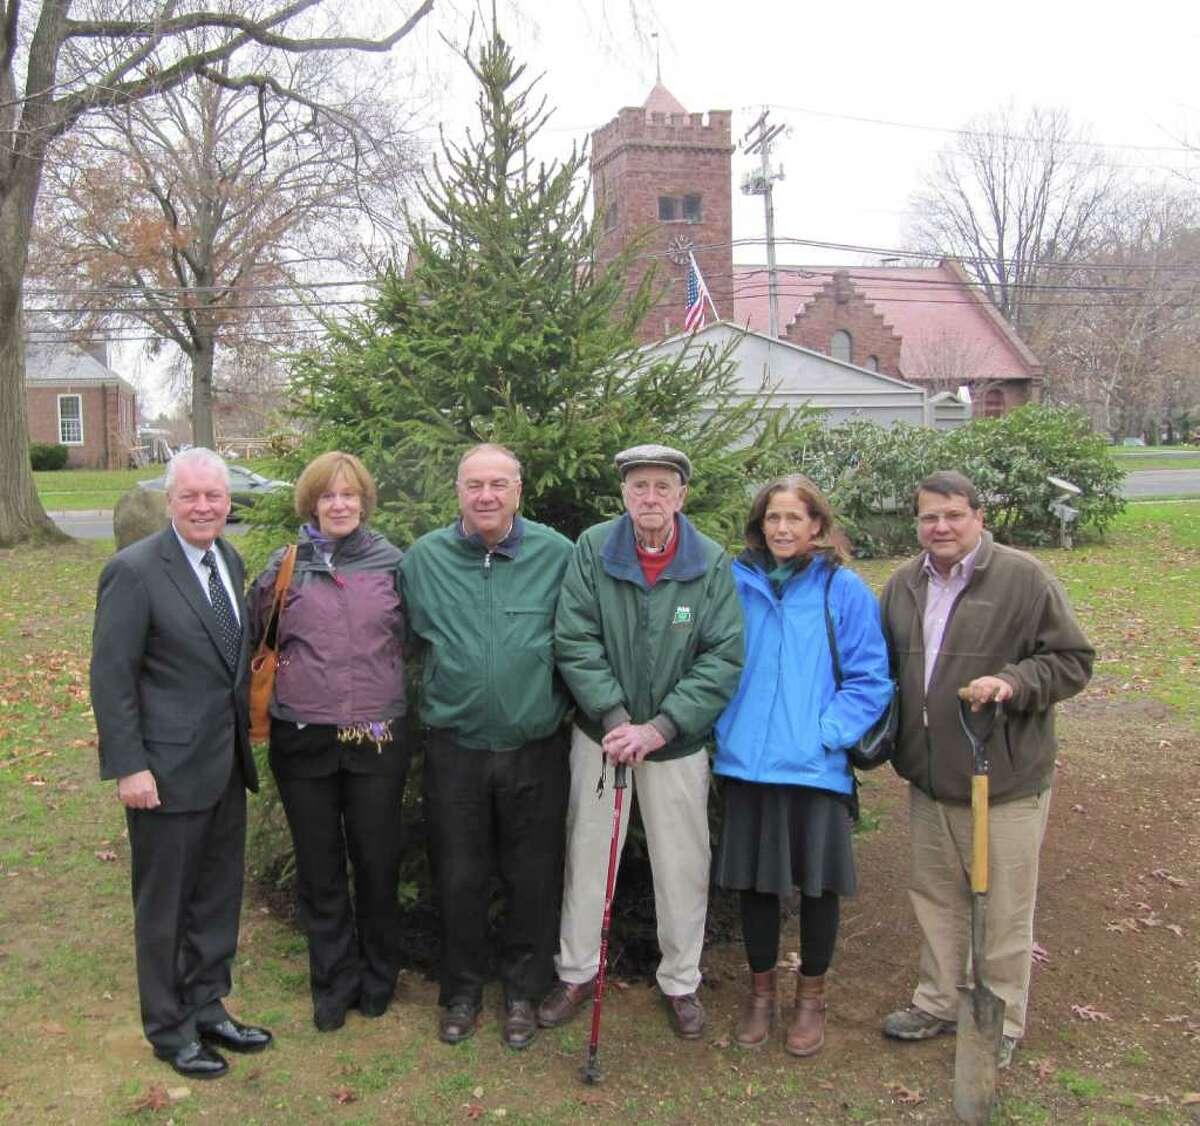 Fairfield Tree Warden Ken Placko (far right) gladly accepted a